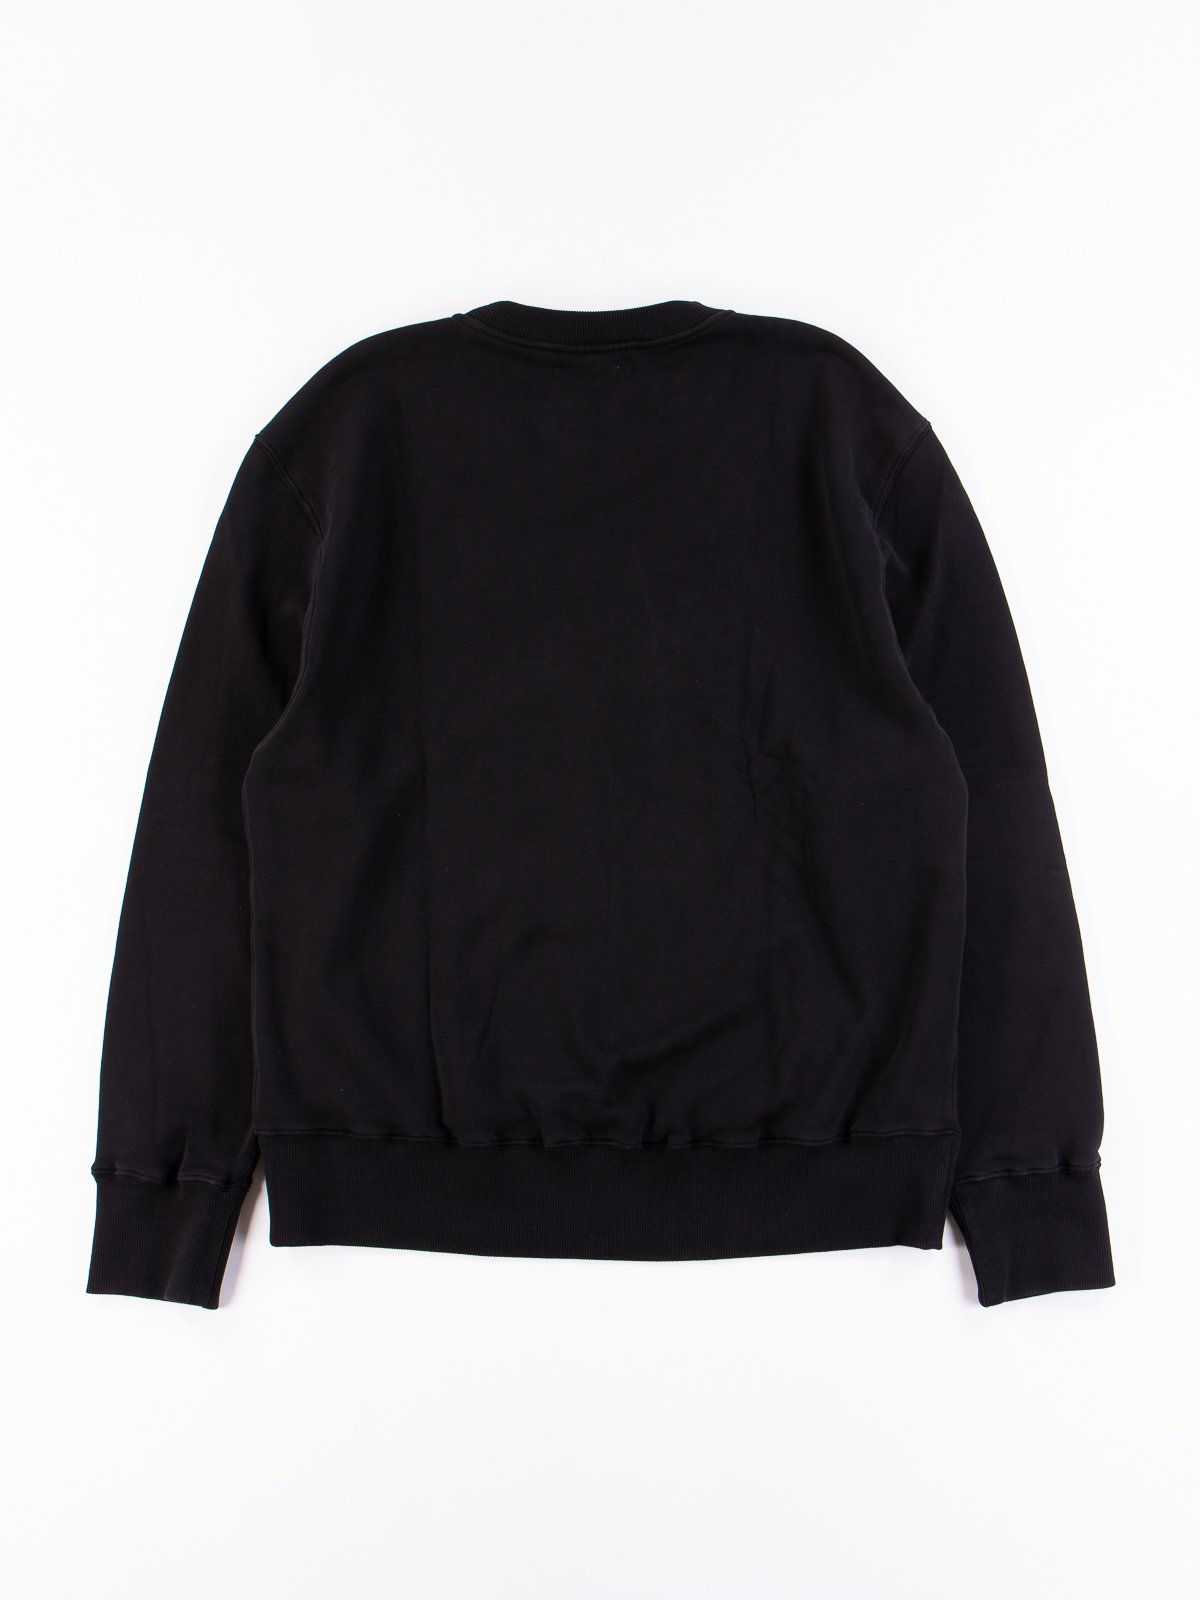 Deep Black Good Basics CSWOS01 Oversized Crew Neck Sweater - Image 5